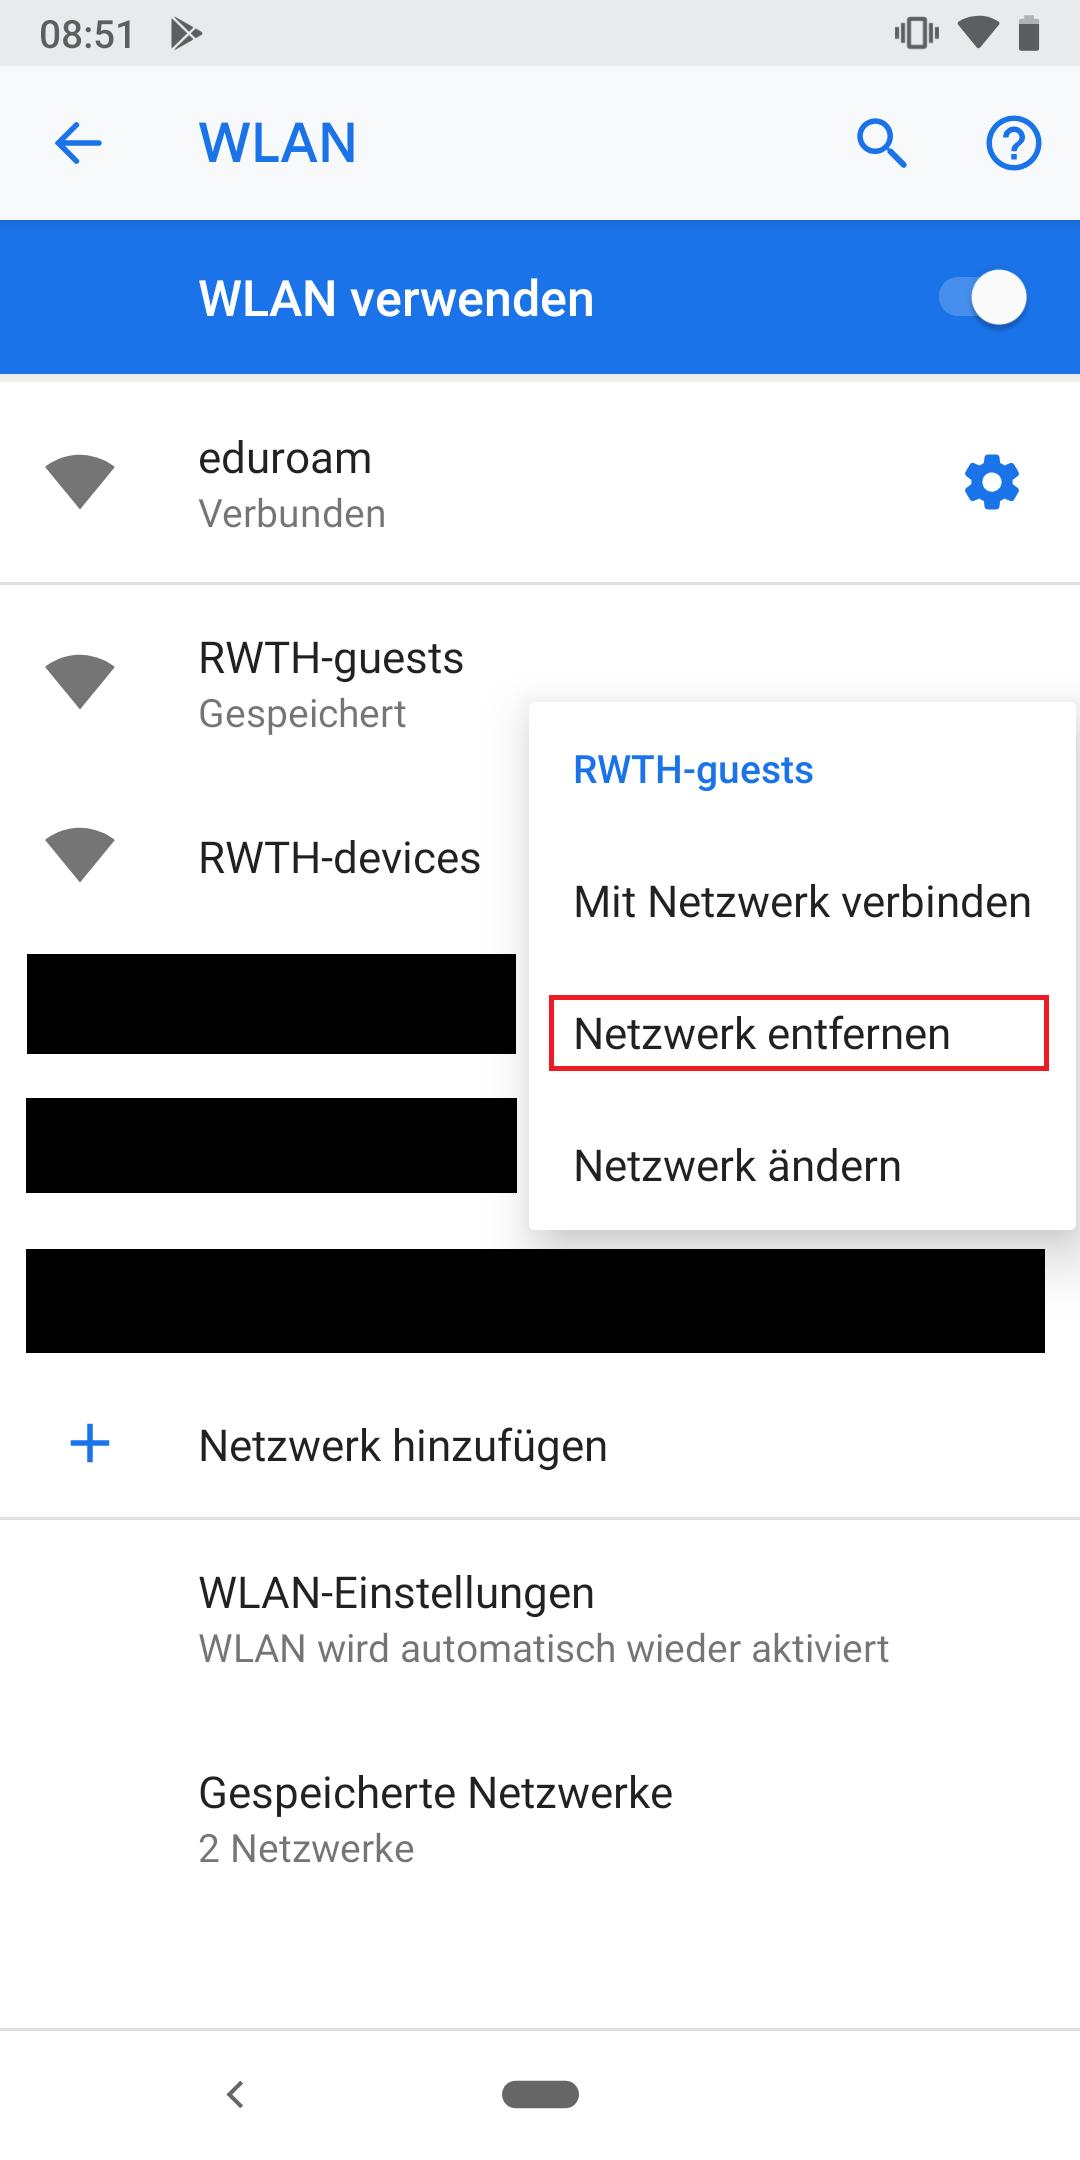 RWTH-guest entfernen